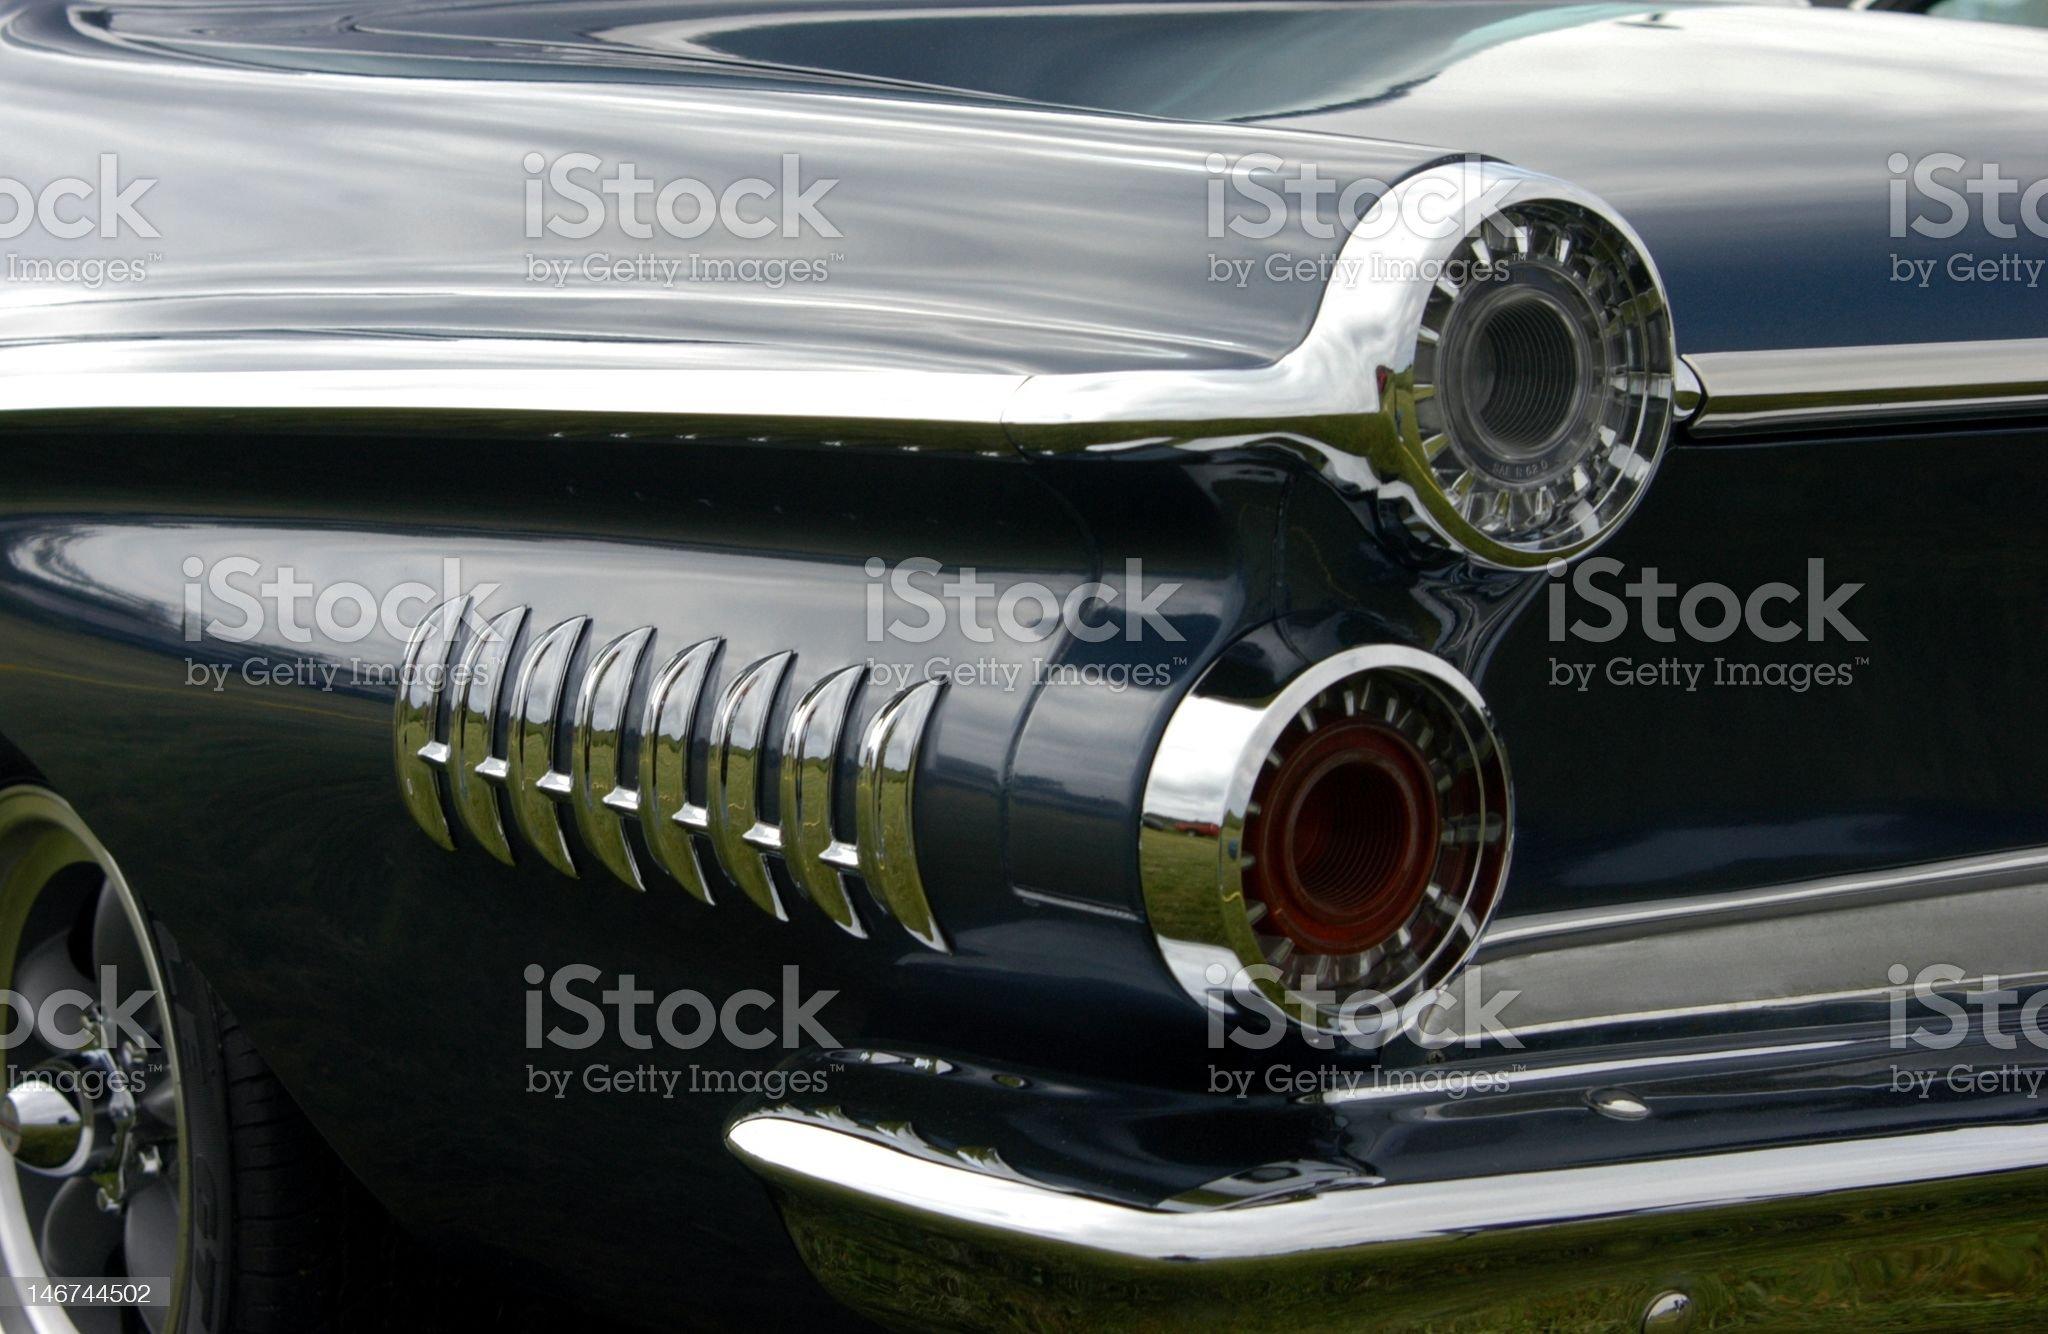 Sixty Two Dodge Dart royalty-free stock photo